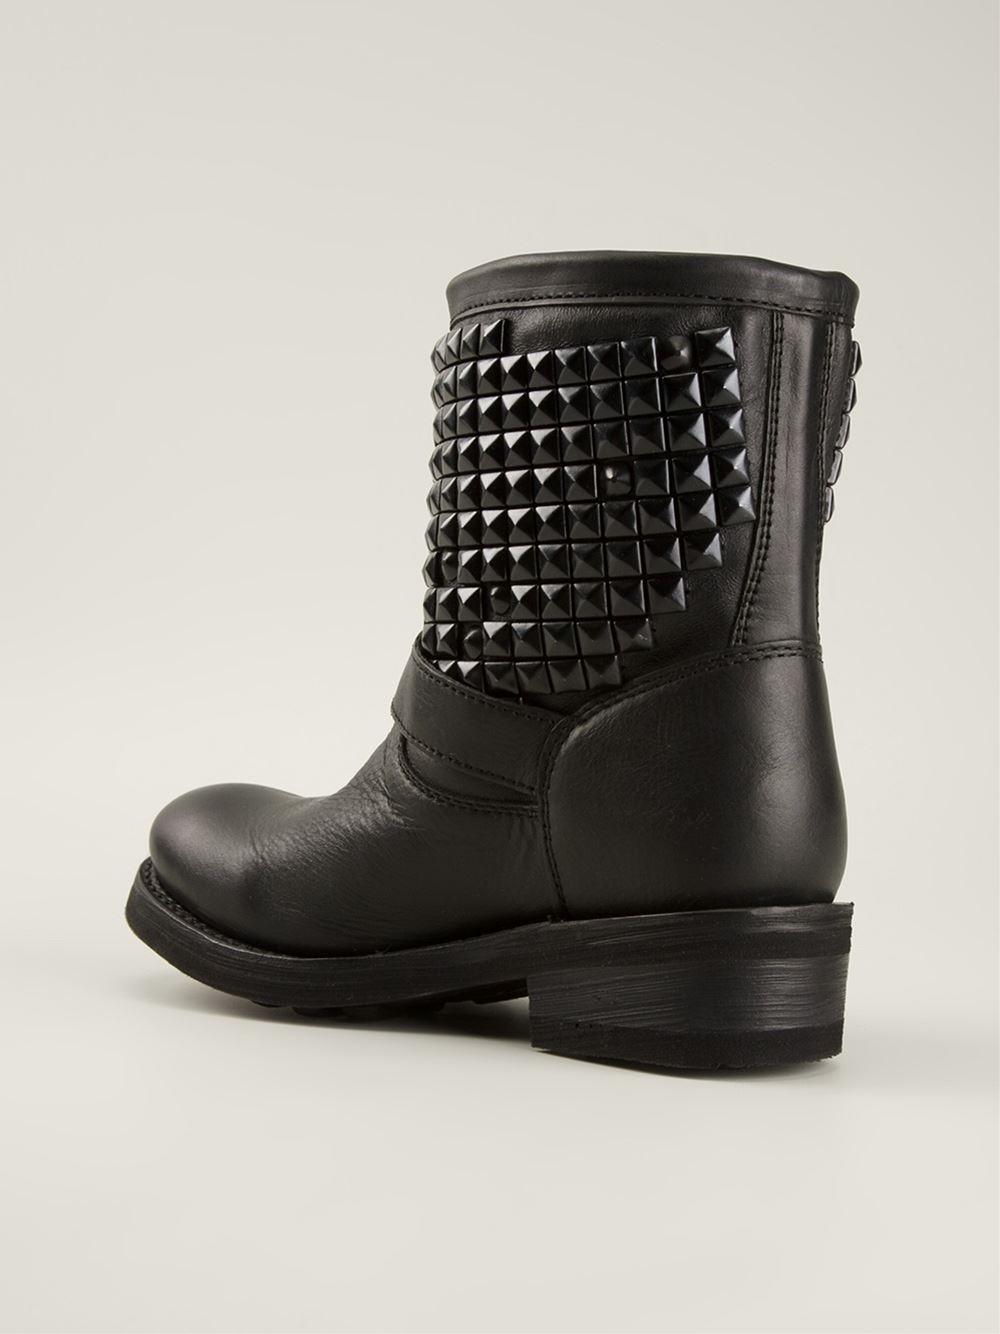 28887e34e7a333 boots ash titan noir,Femme Bottines Boots Ash TERRIBLE noir,ash zania  espadrilles,boots ash trash,